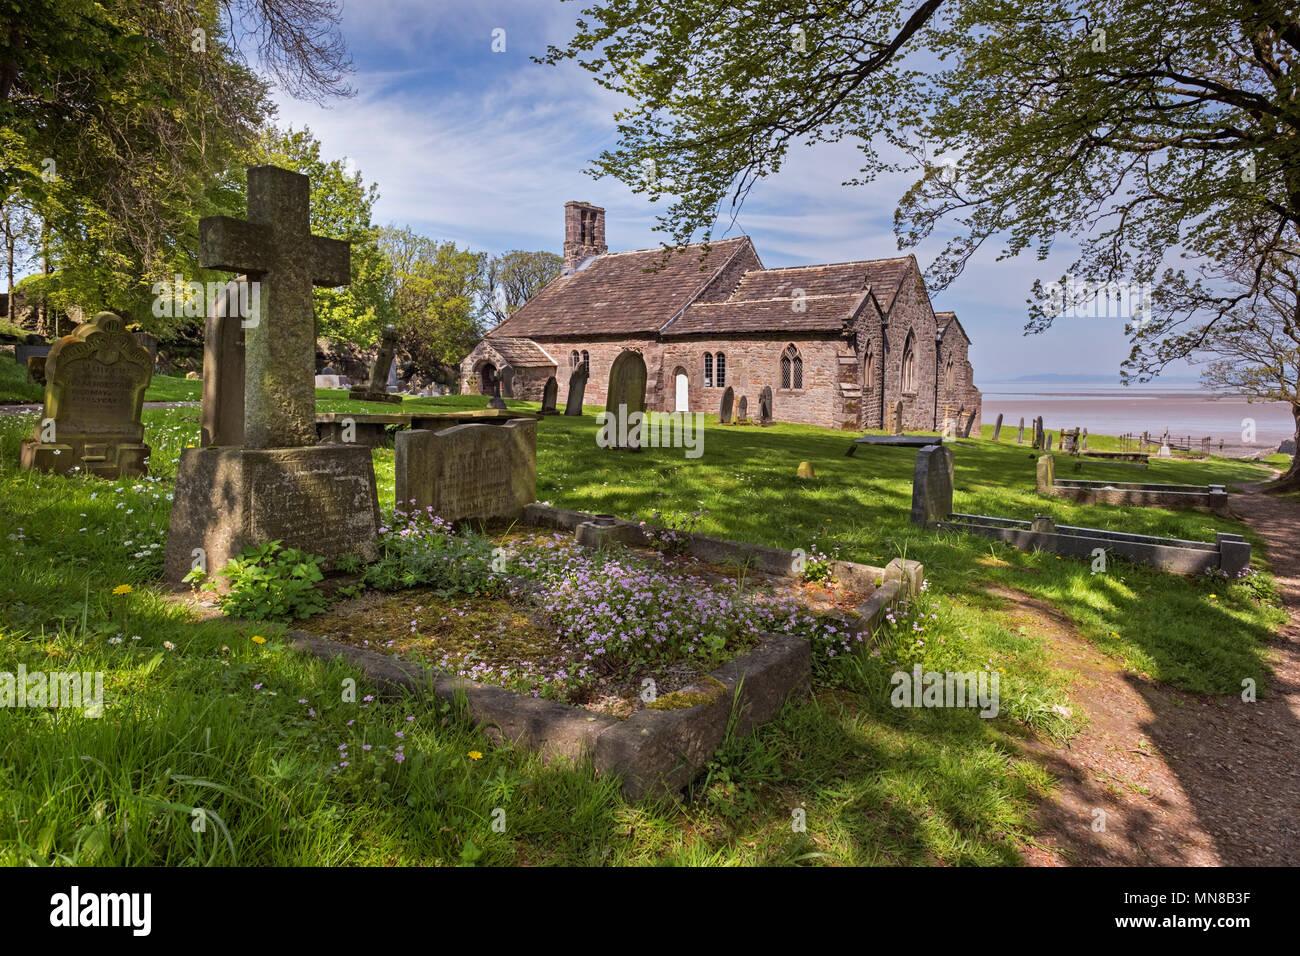 St Peter's Church, Heysham Village, Morecambe Bay, Lancashire, UK Stock Photo